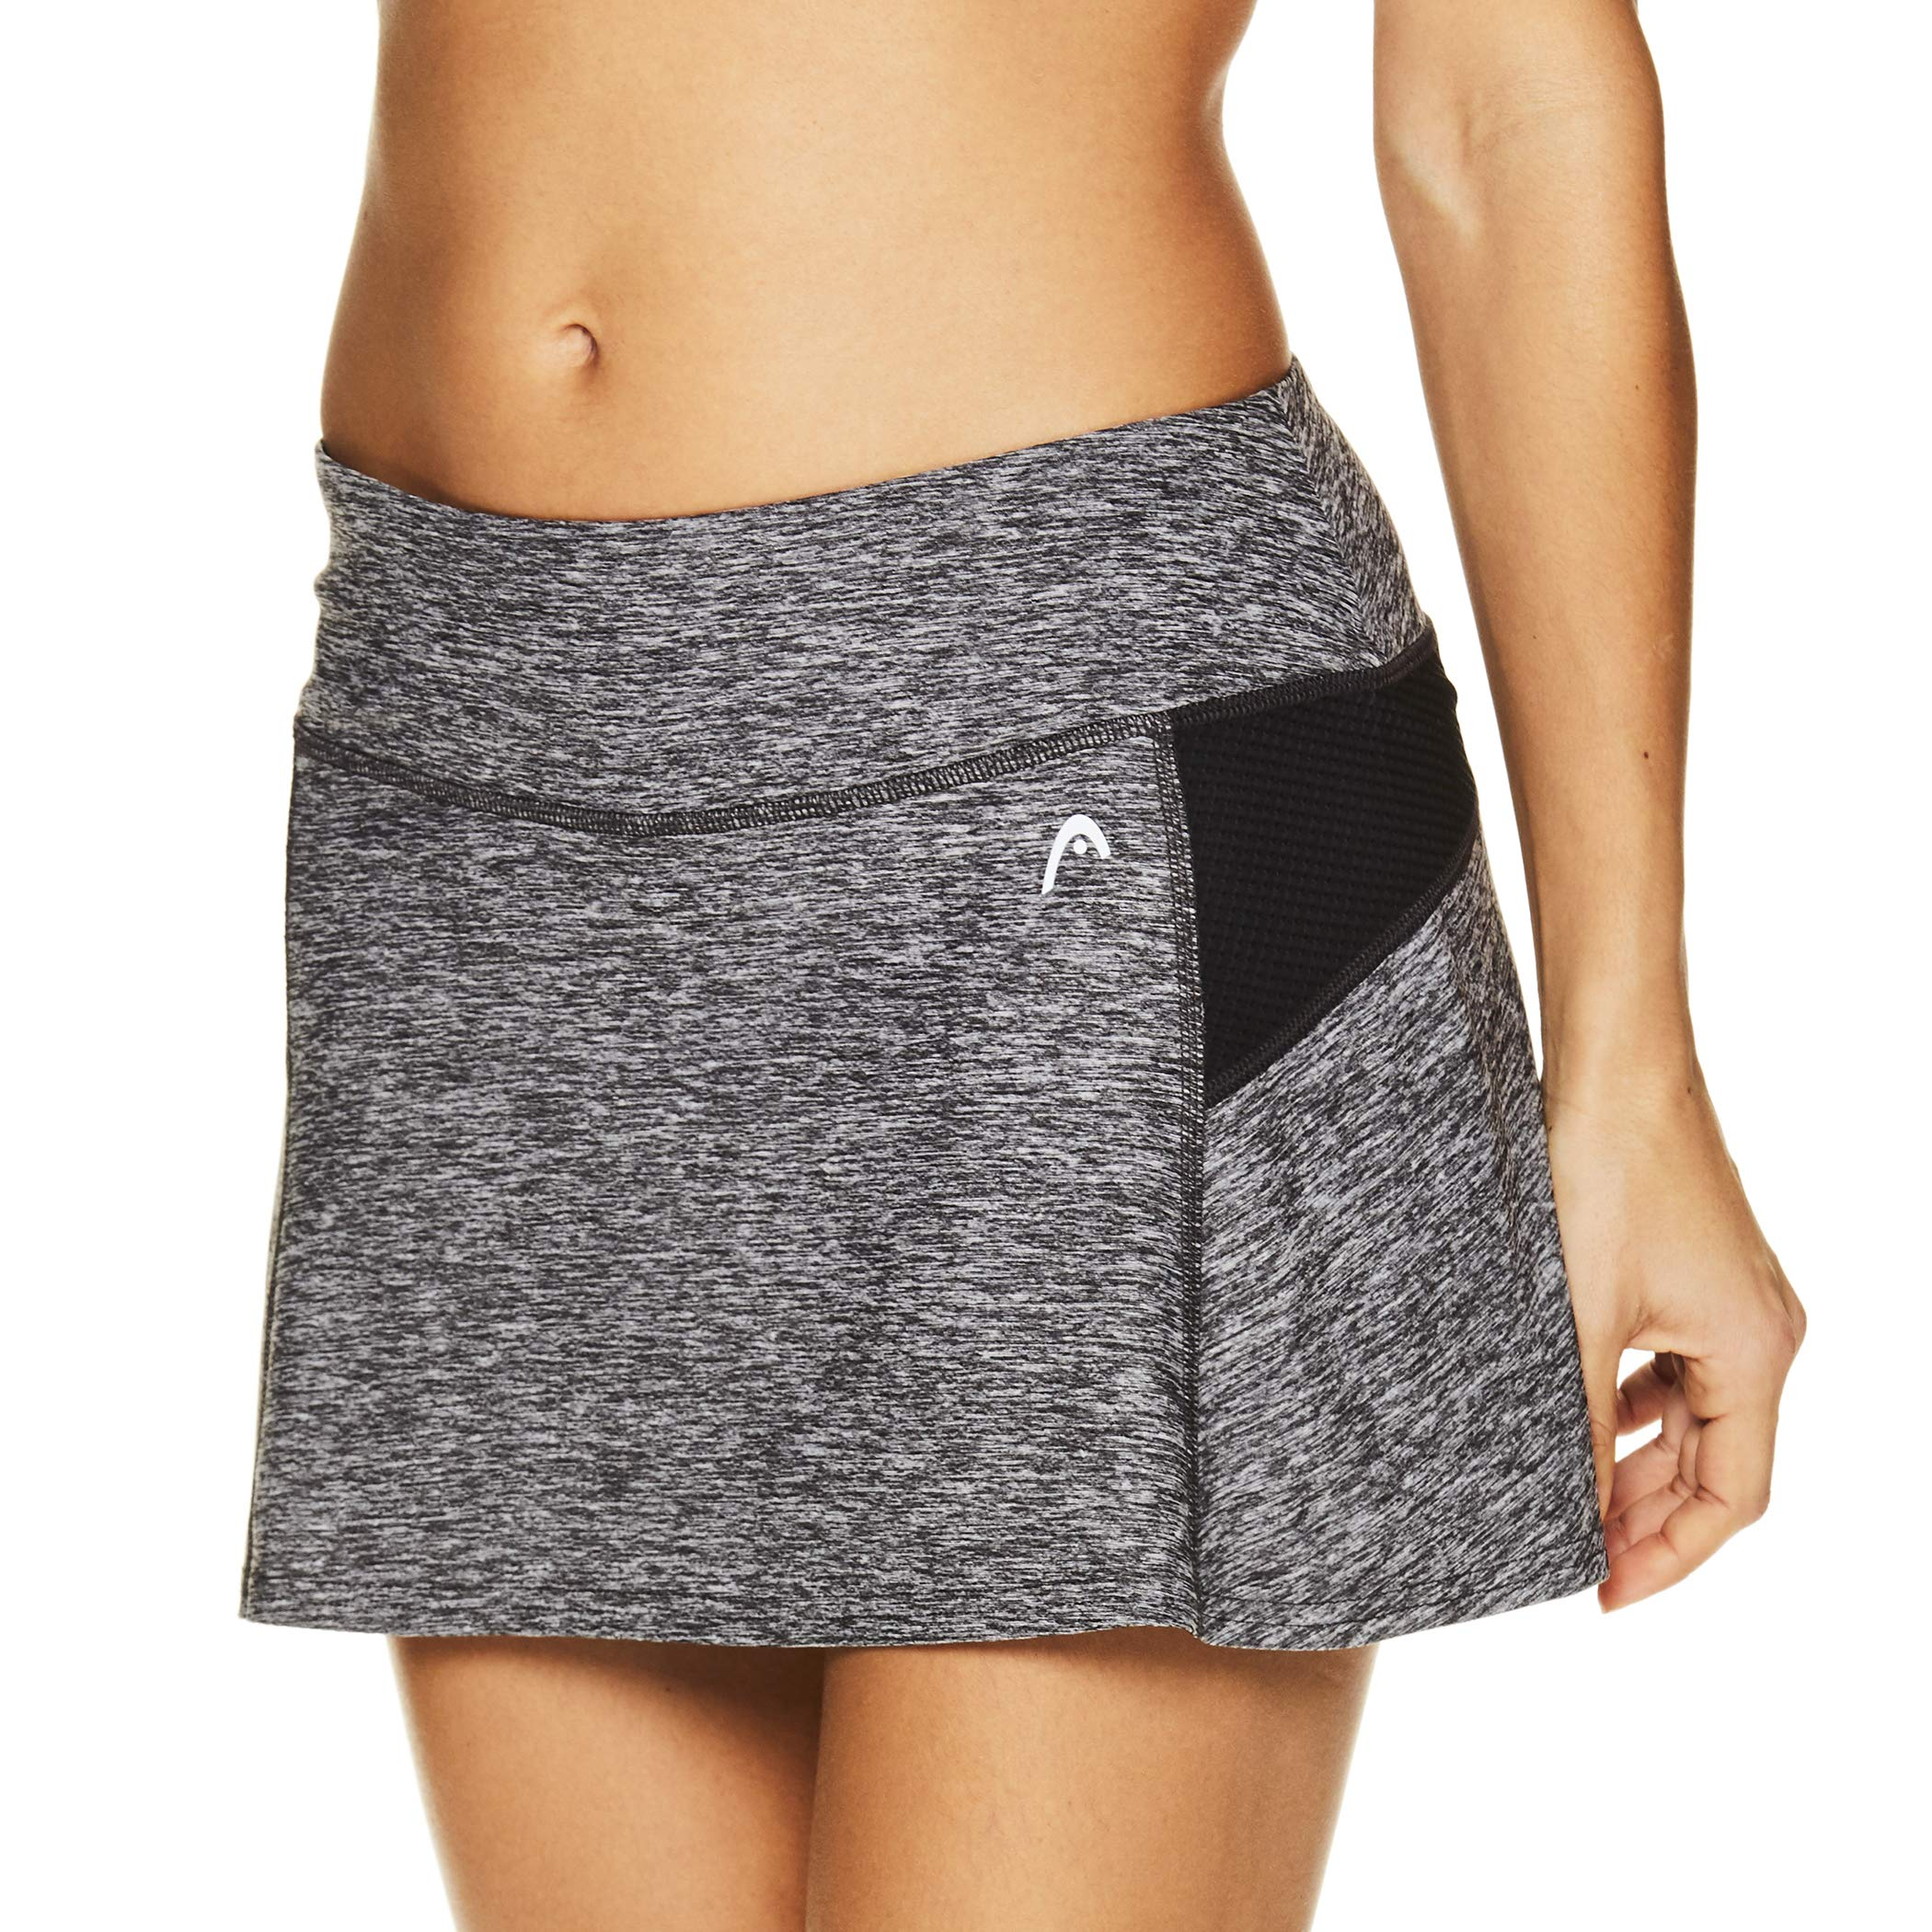 HEAD Women's Athletic Tennis Skort - Performance Training & Running Skirt - Fresh Mesh Black Heather, X-Small